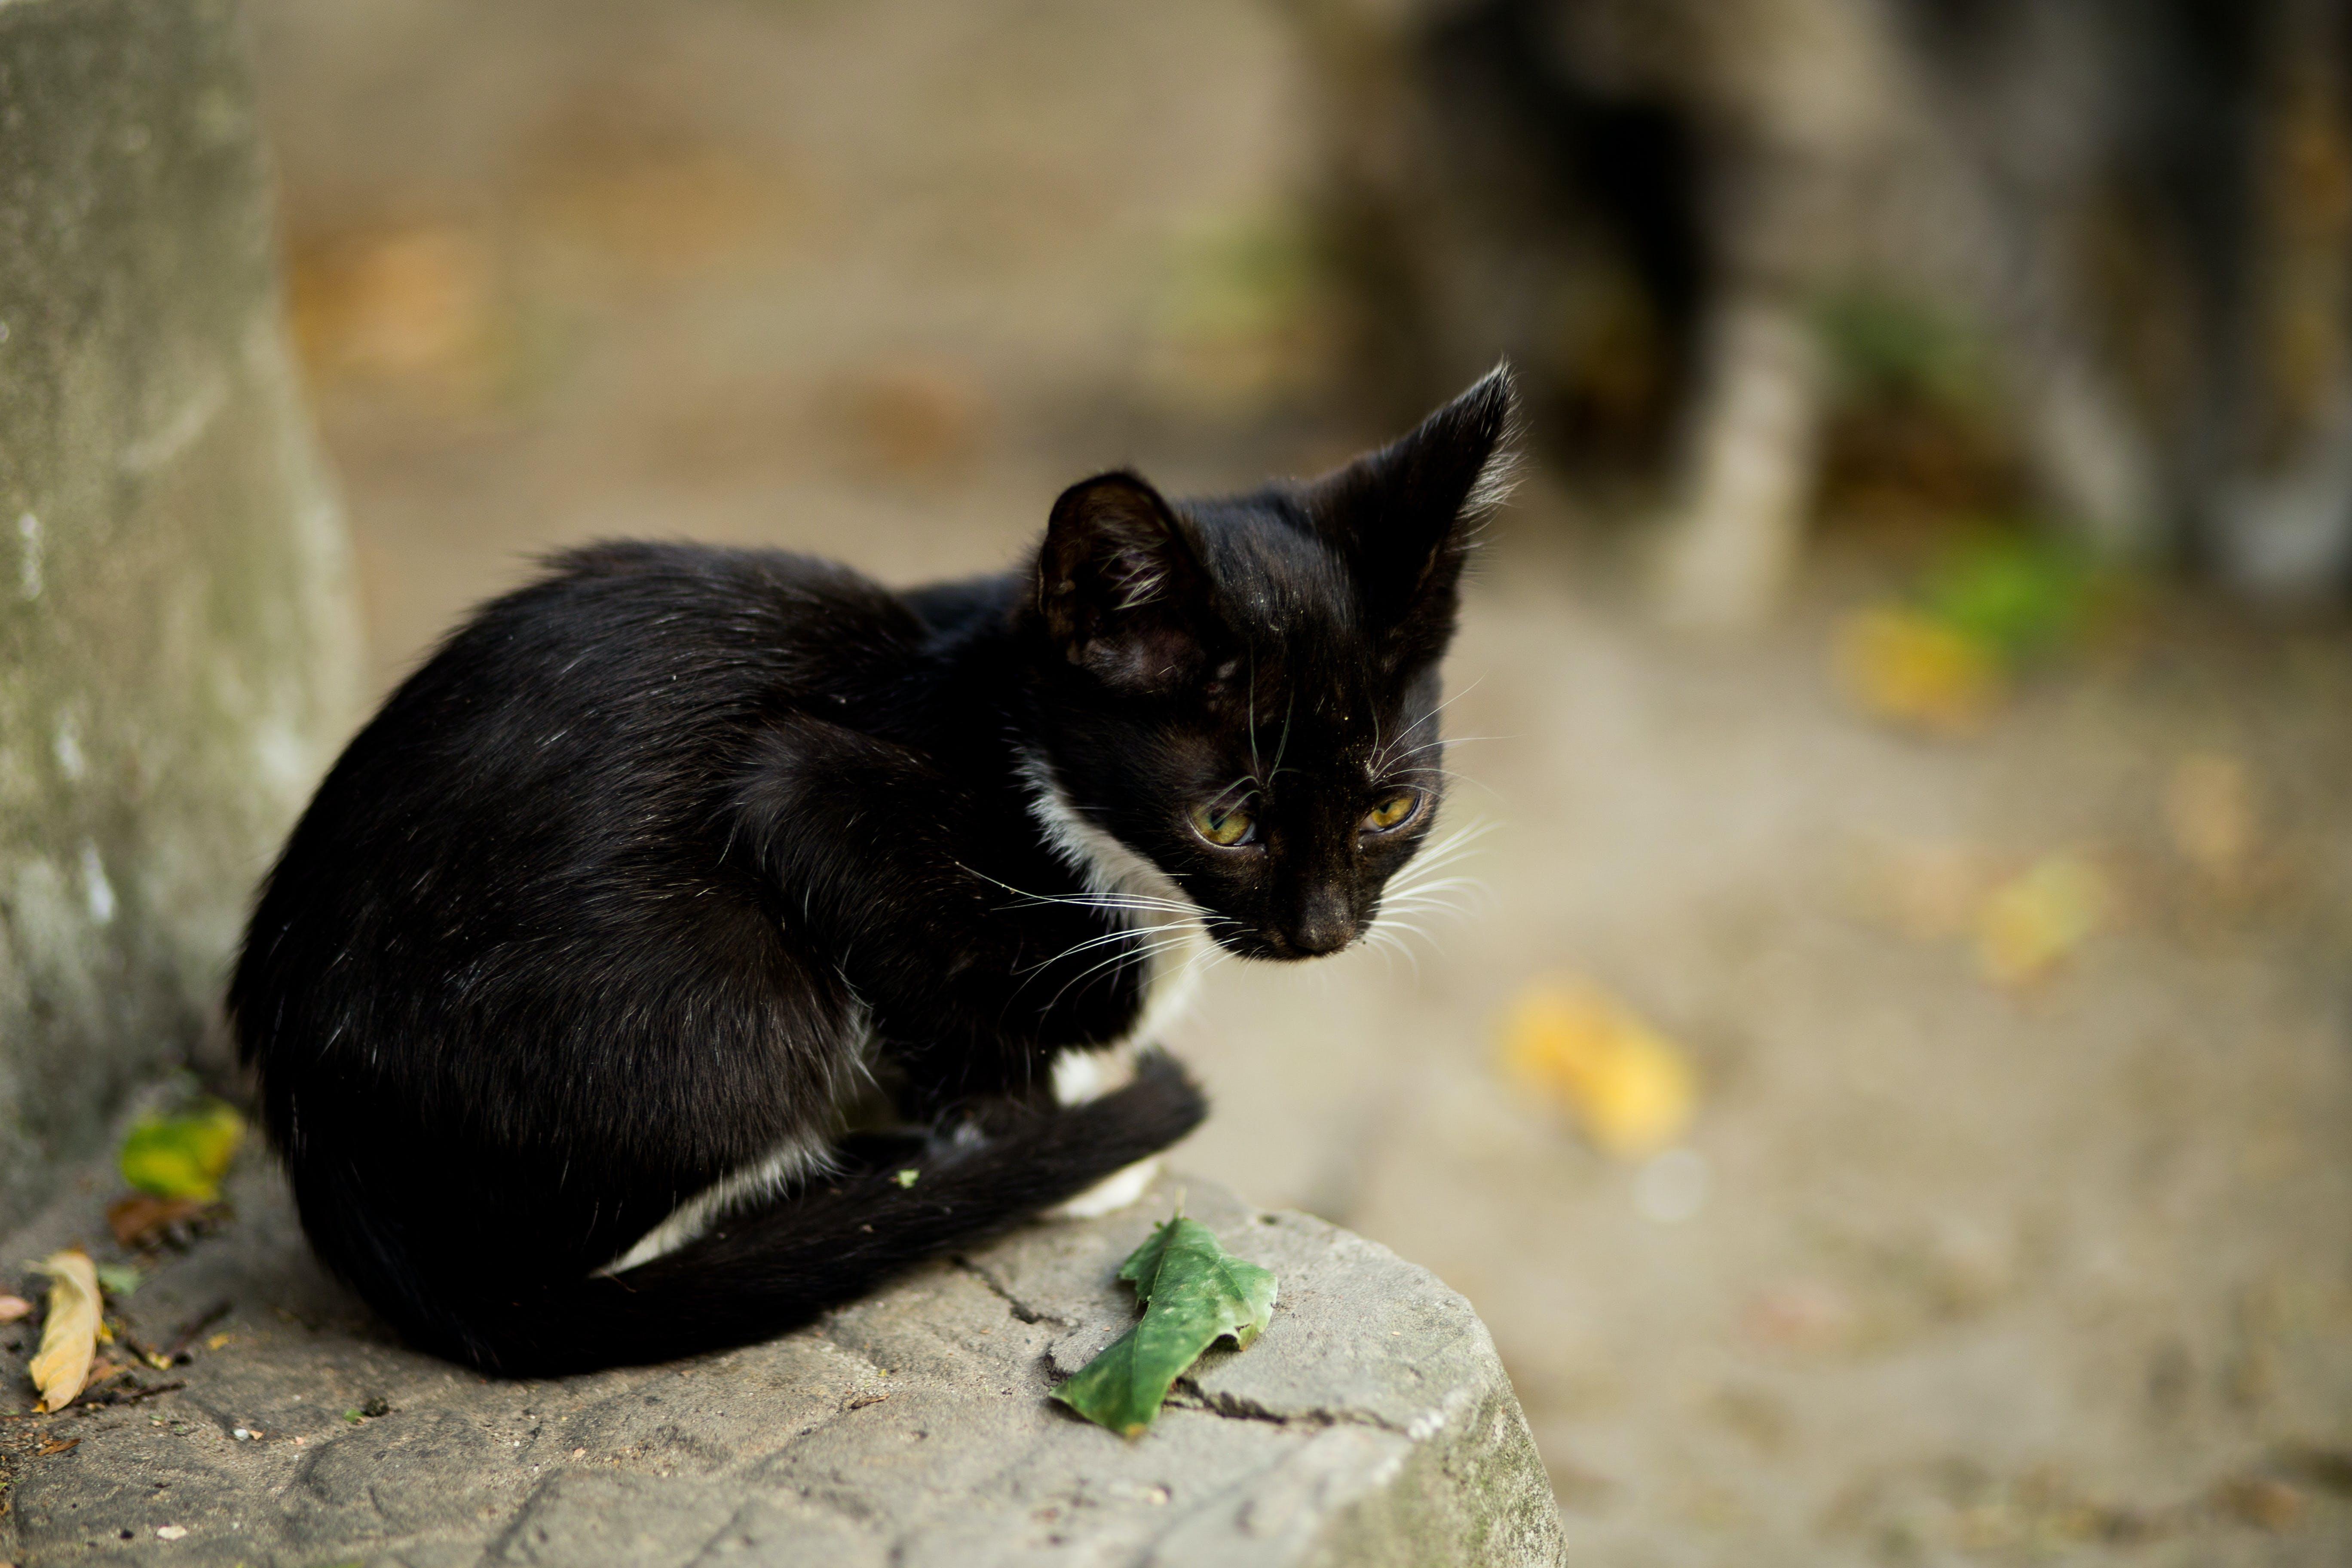 Black Cat Sitting on Gray Concrete Ledge